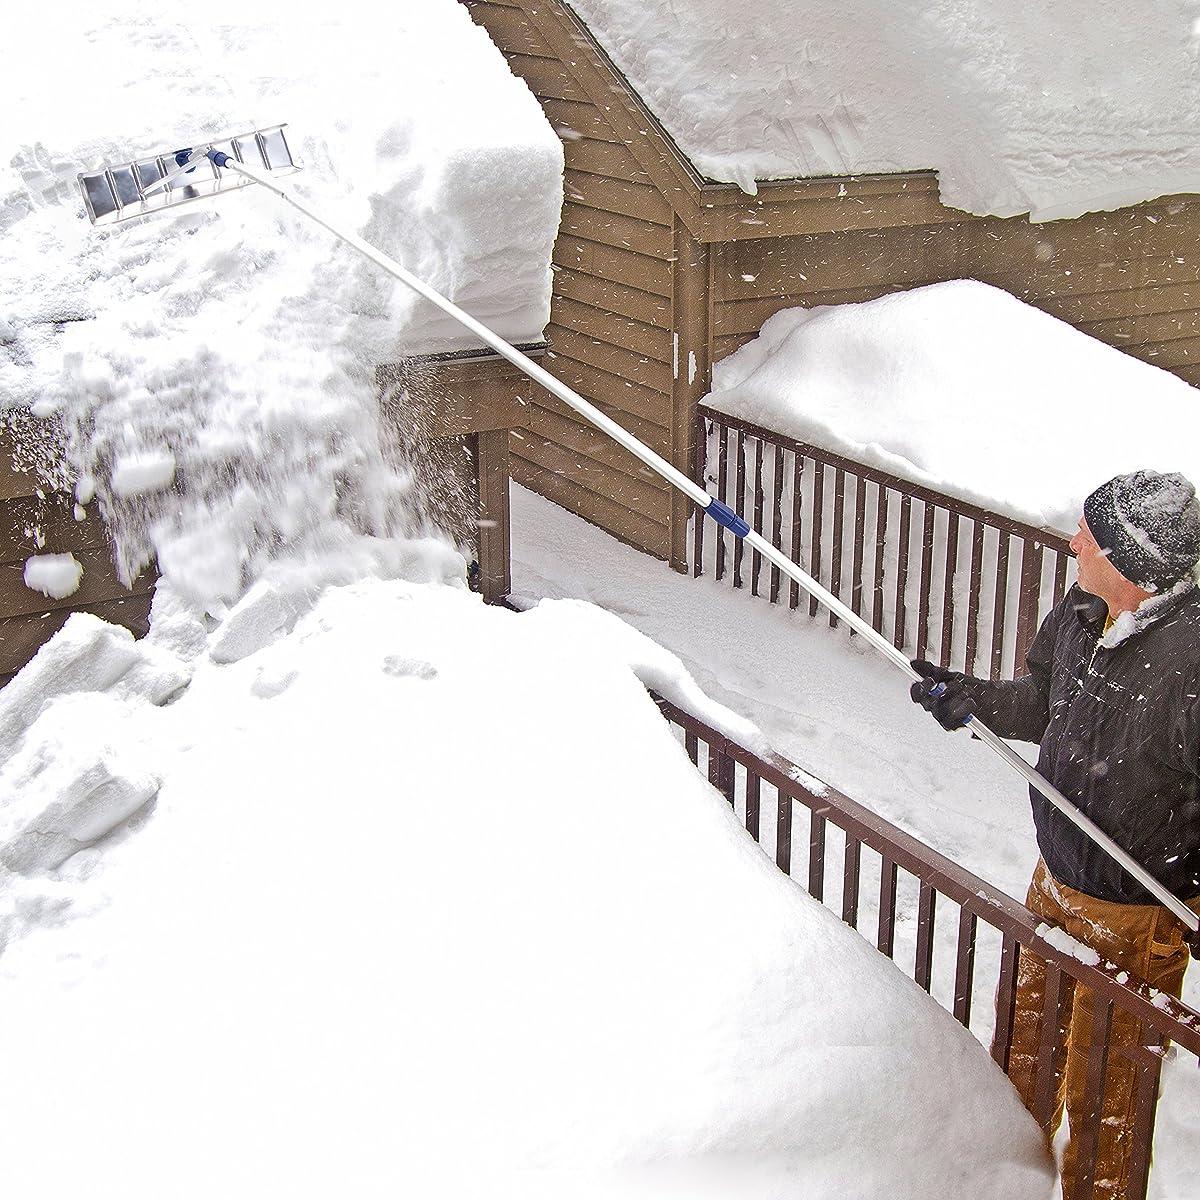 Snow Joe RJ205M Twist-N-Lock Telescoping Snow Shovel Aluminum Roof Rake, 21